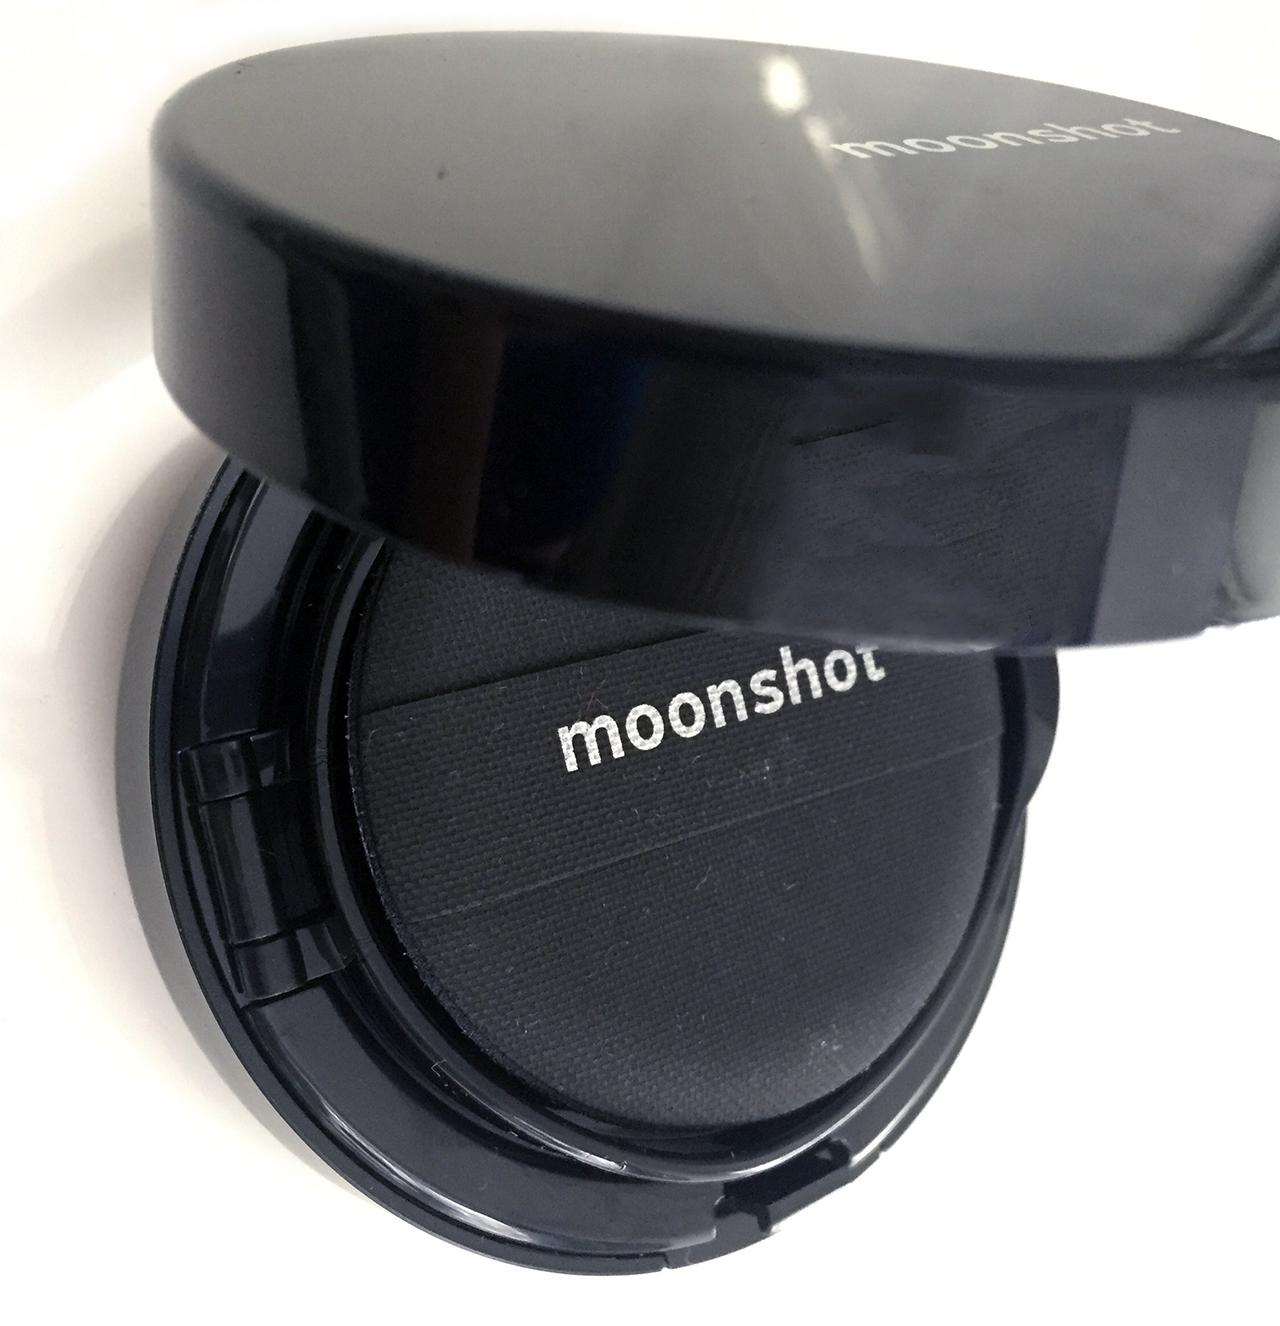 Moonshot Microfit GD cushion